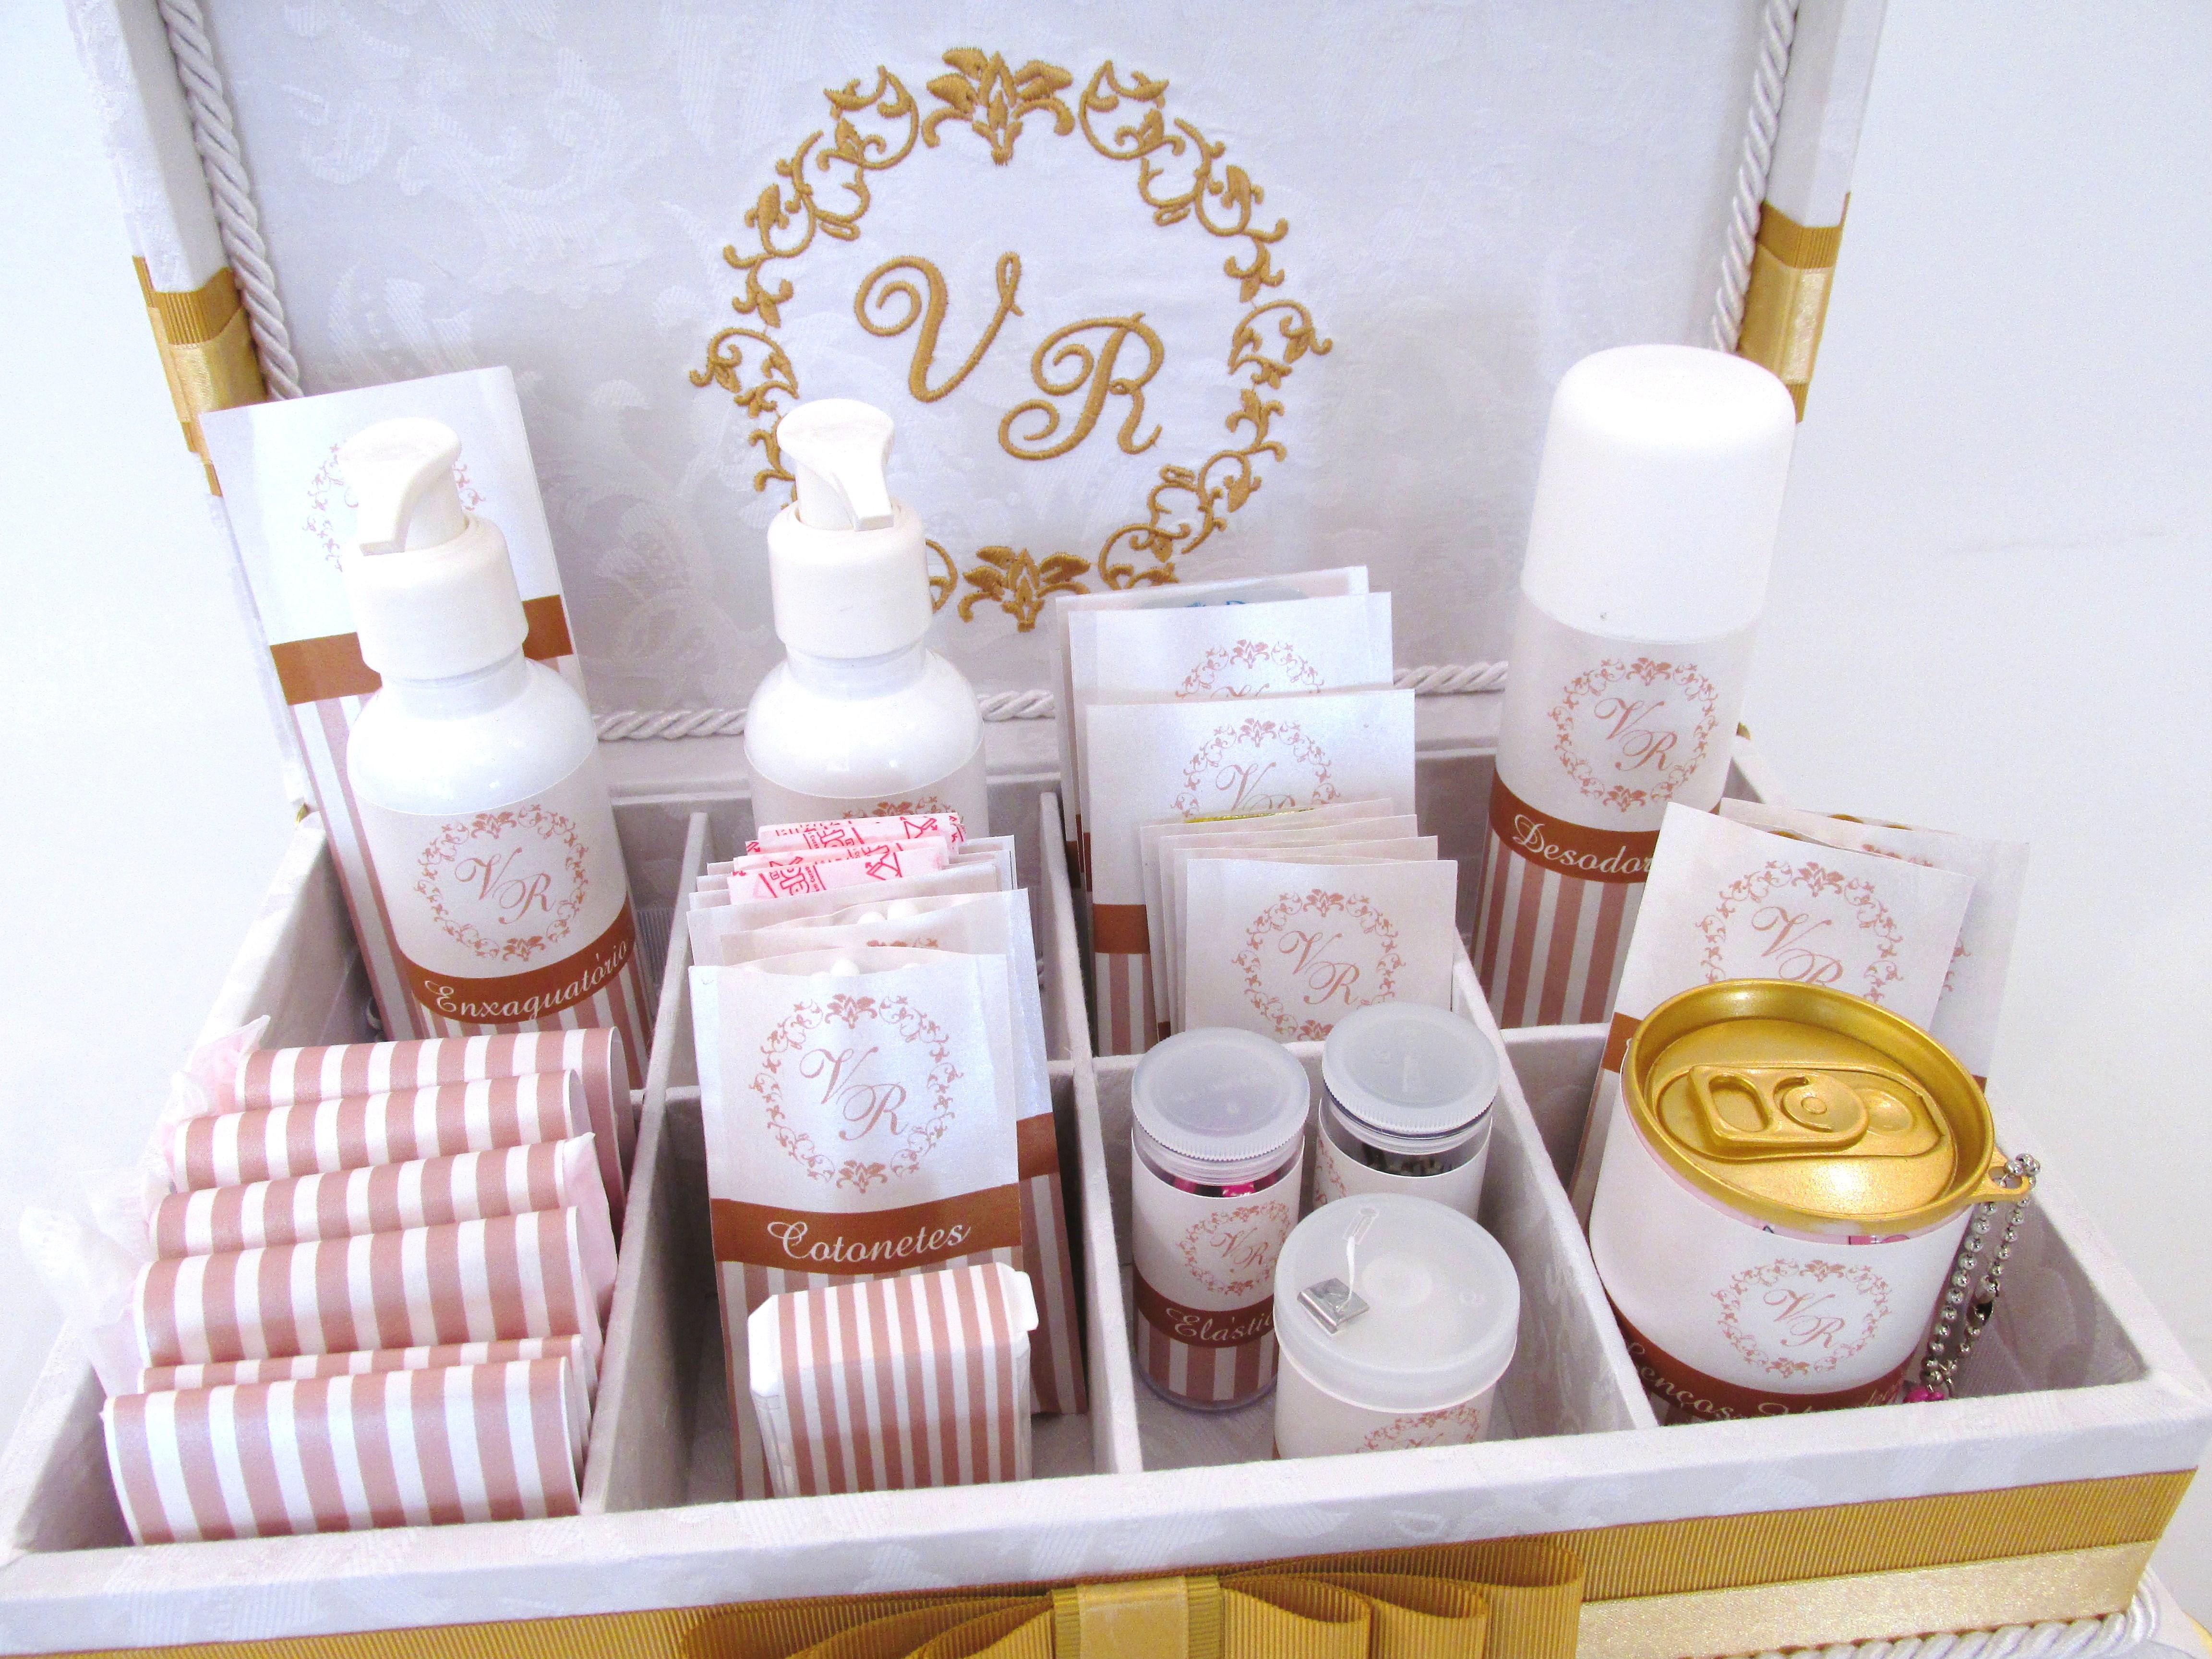 Caixa Kit Banheiro para casamento Caixa Kit Banheiro para casamento #986B31 4608 3456